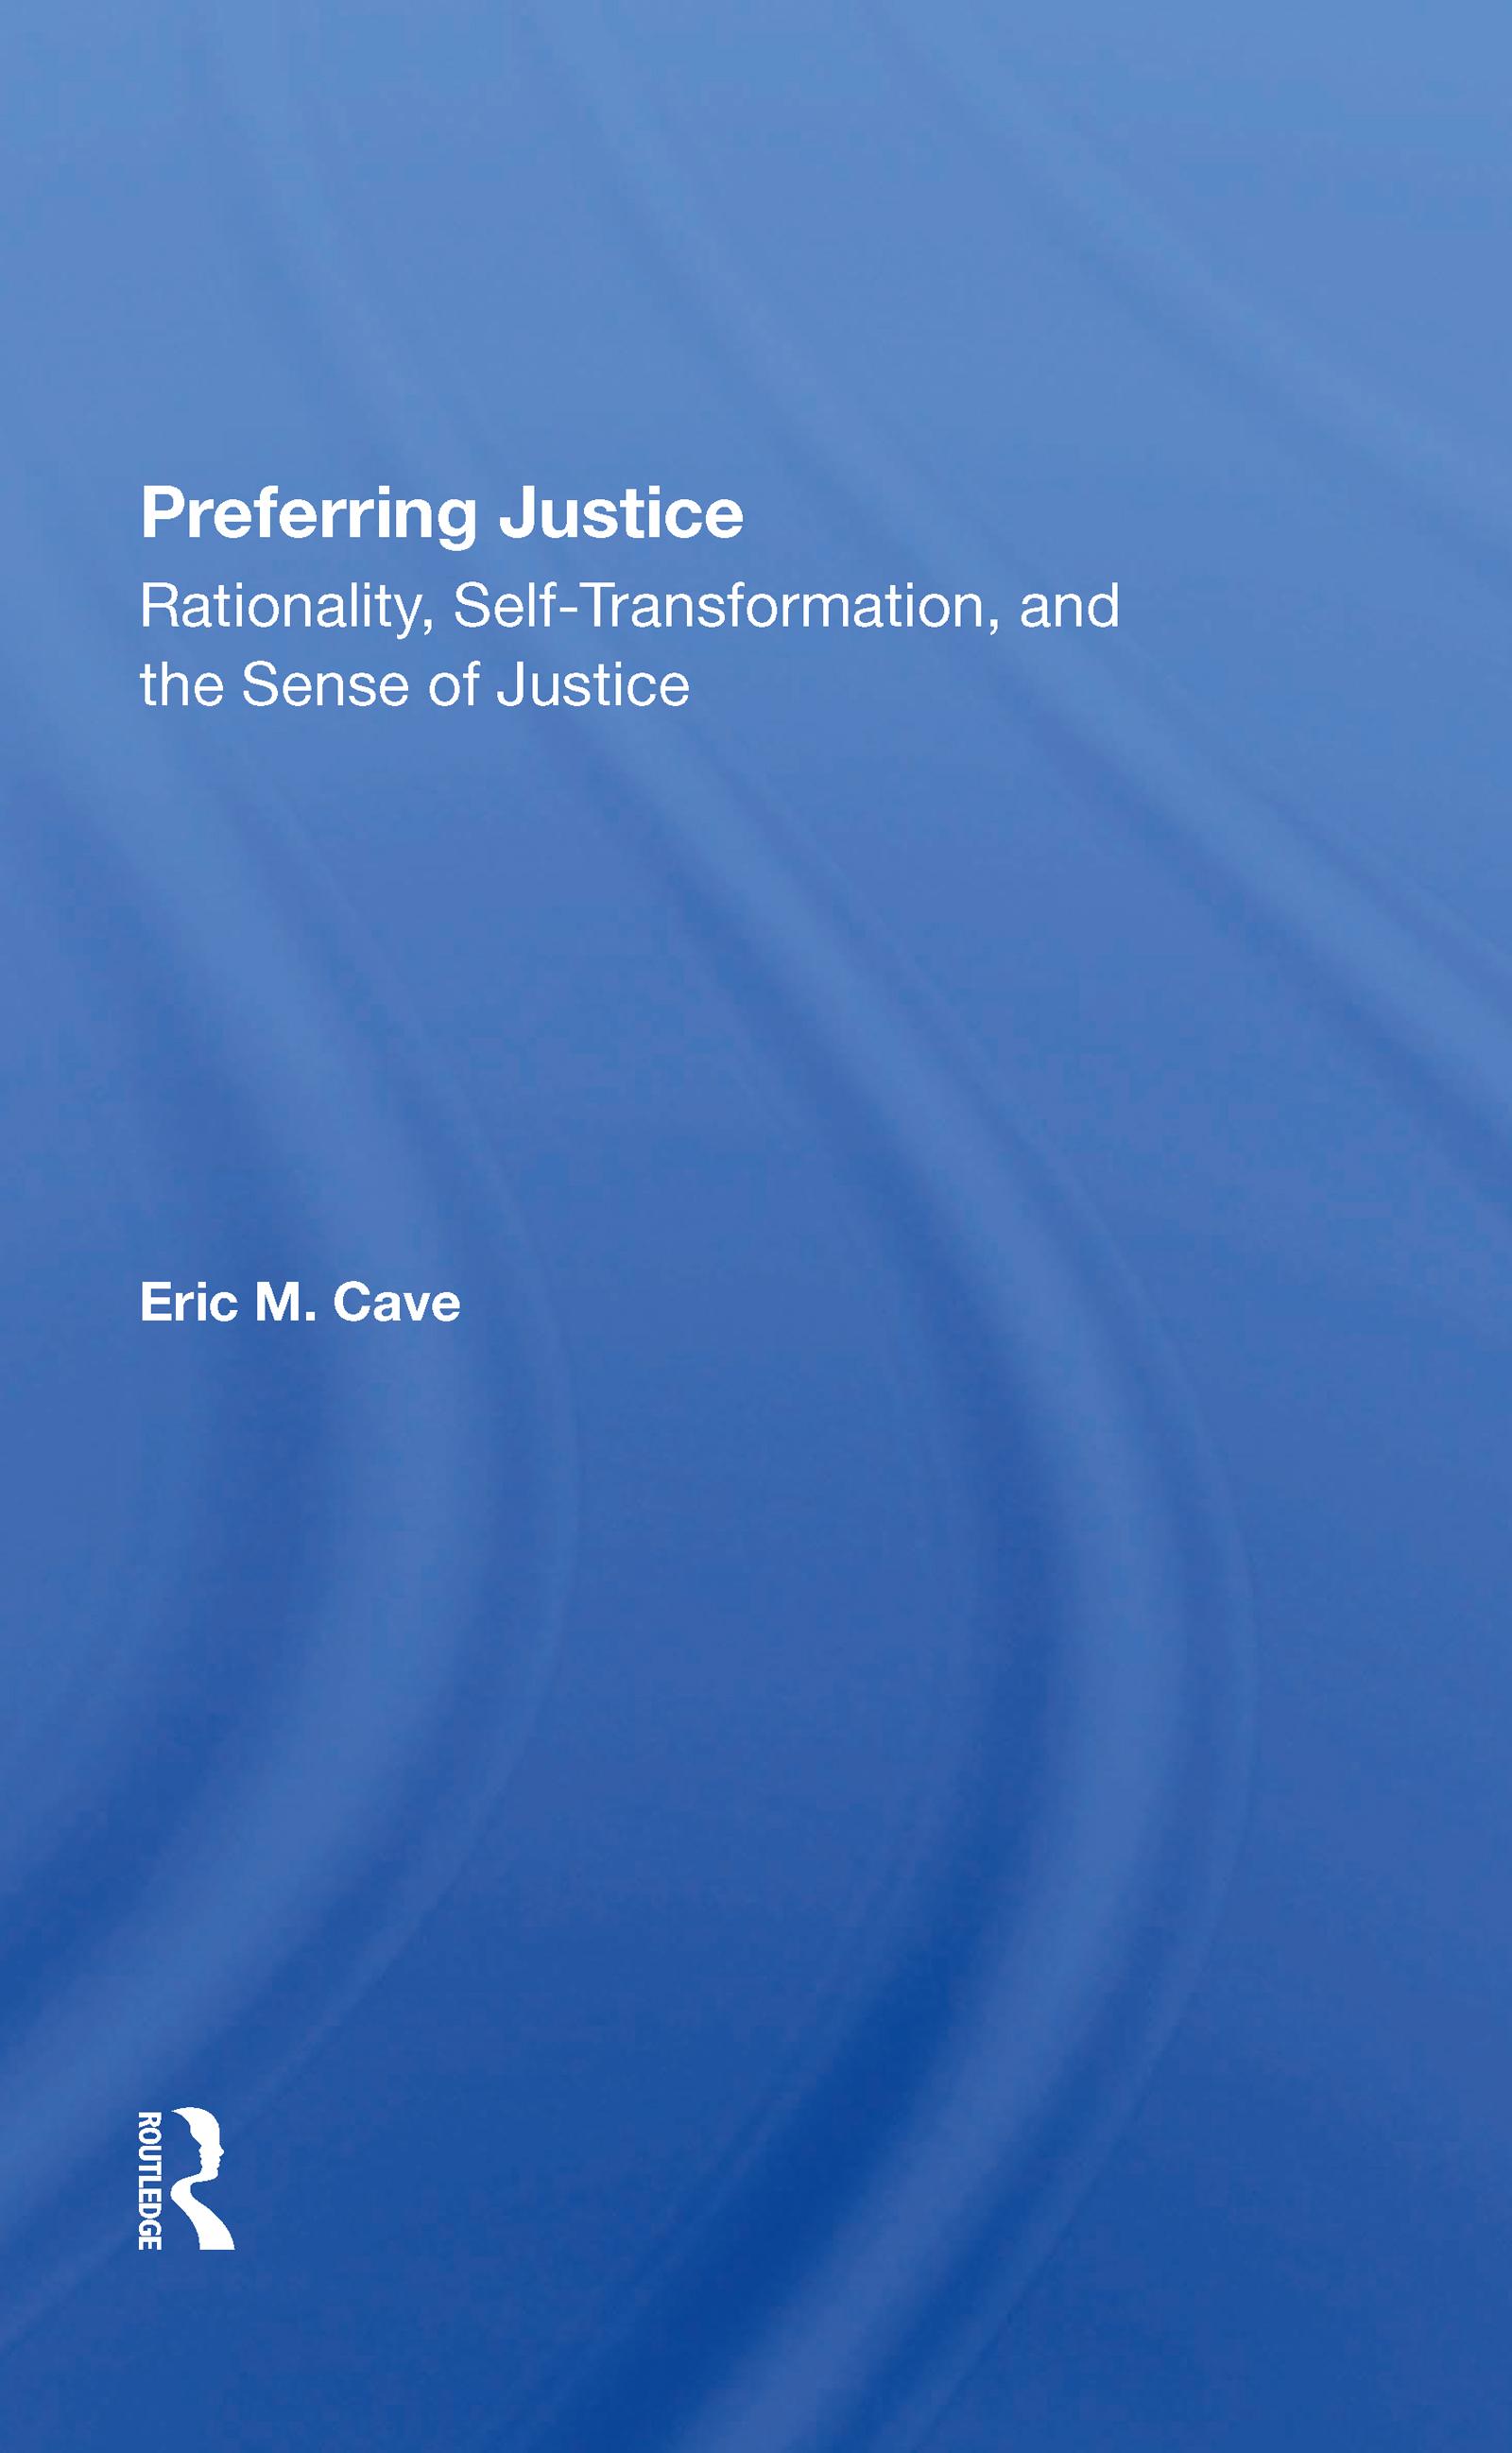 Preferring Justice